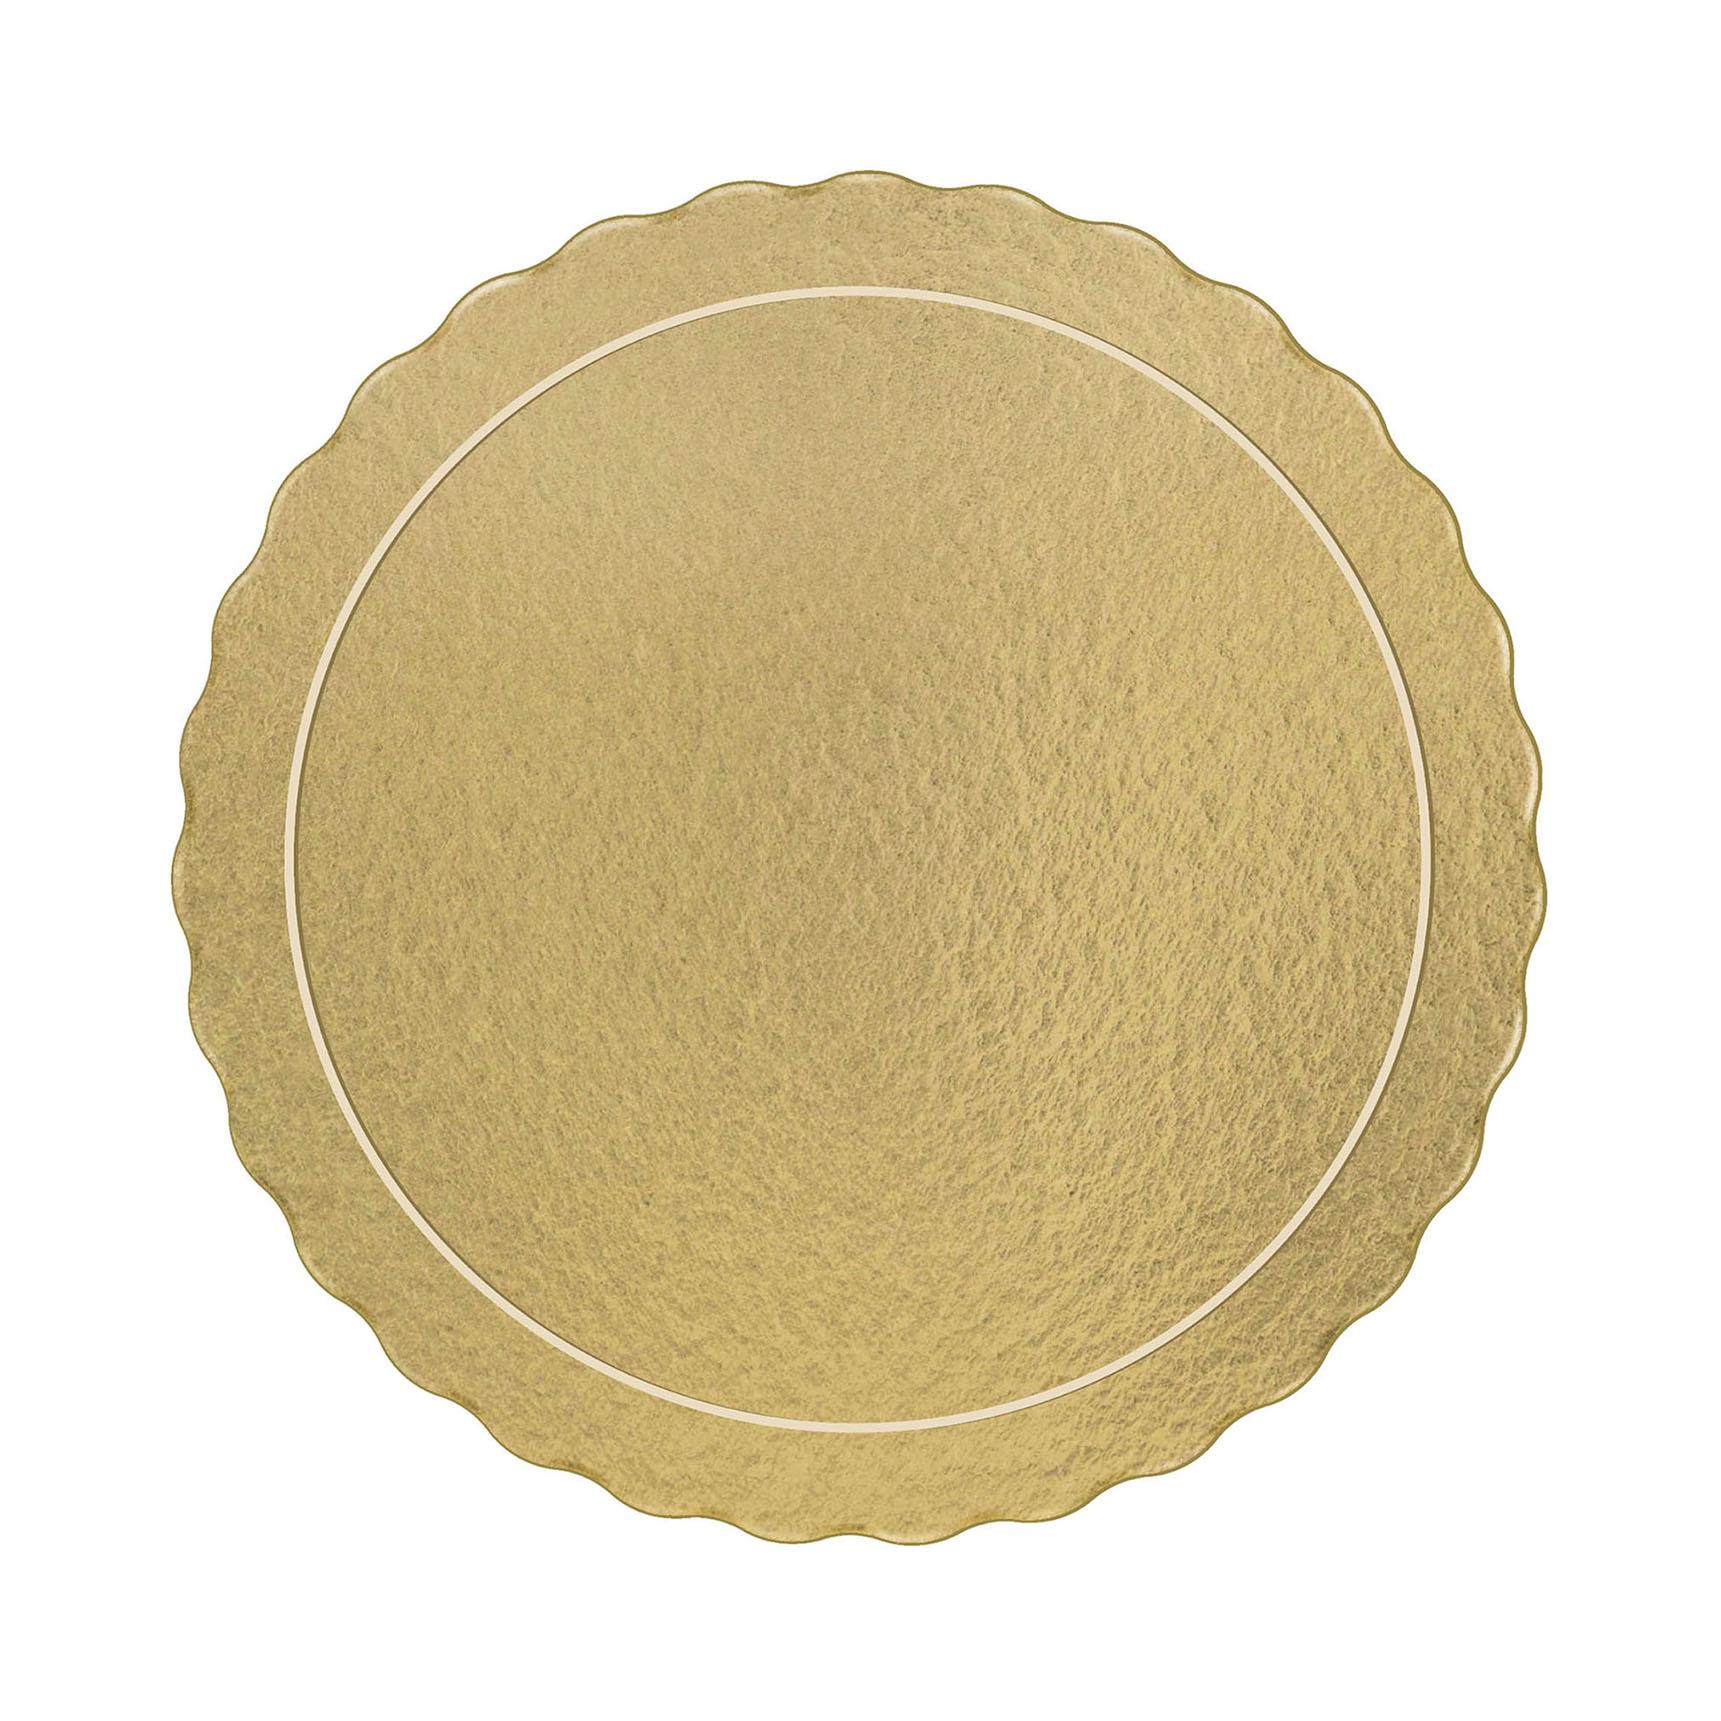 100 Bases Laminadas, Suporte P/ Bolo, Cake Board, Kit 28 e 32cm - Ouro